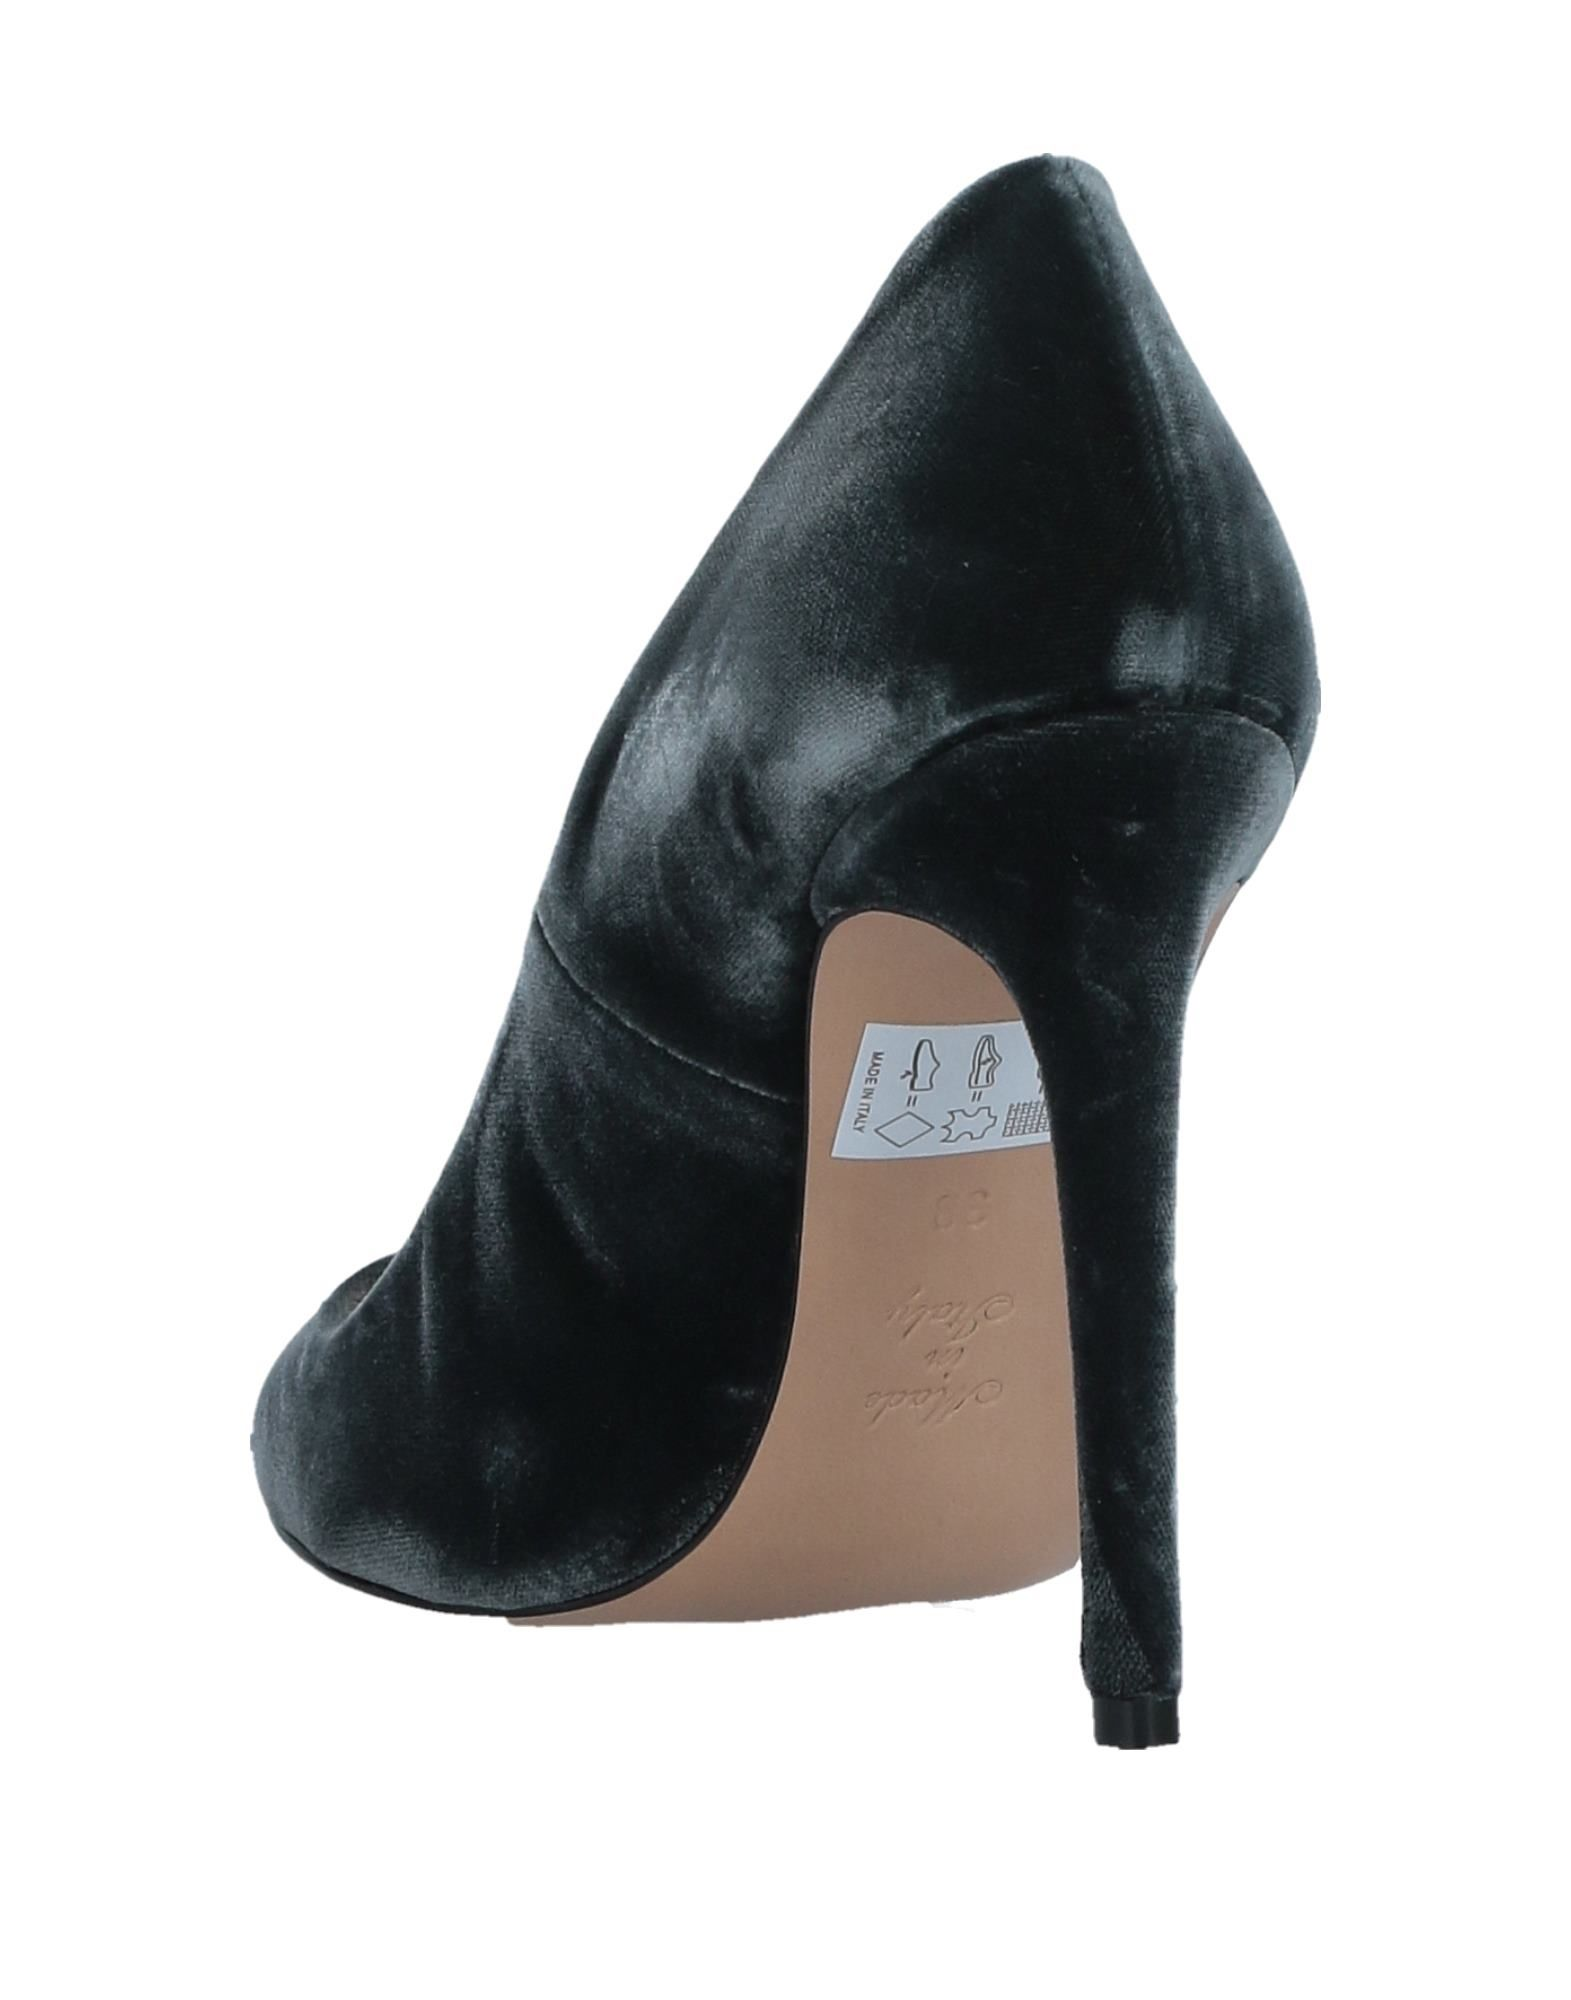 Ovye' By Gute Cristina Lucchi Pumps Damen  11537000KJ Gute By Qualität beliebte Schuhe ae703a